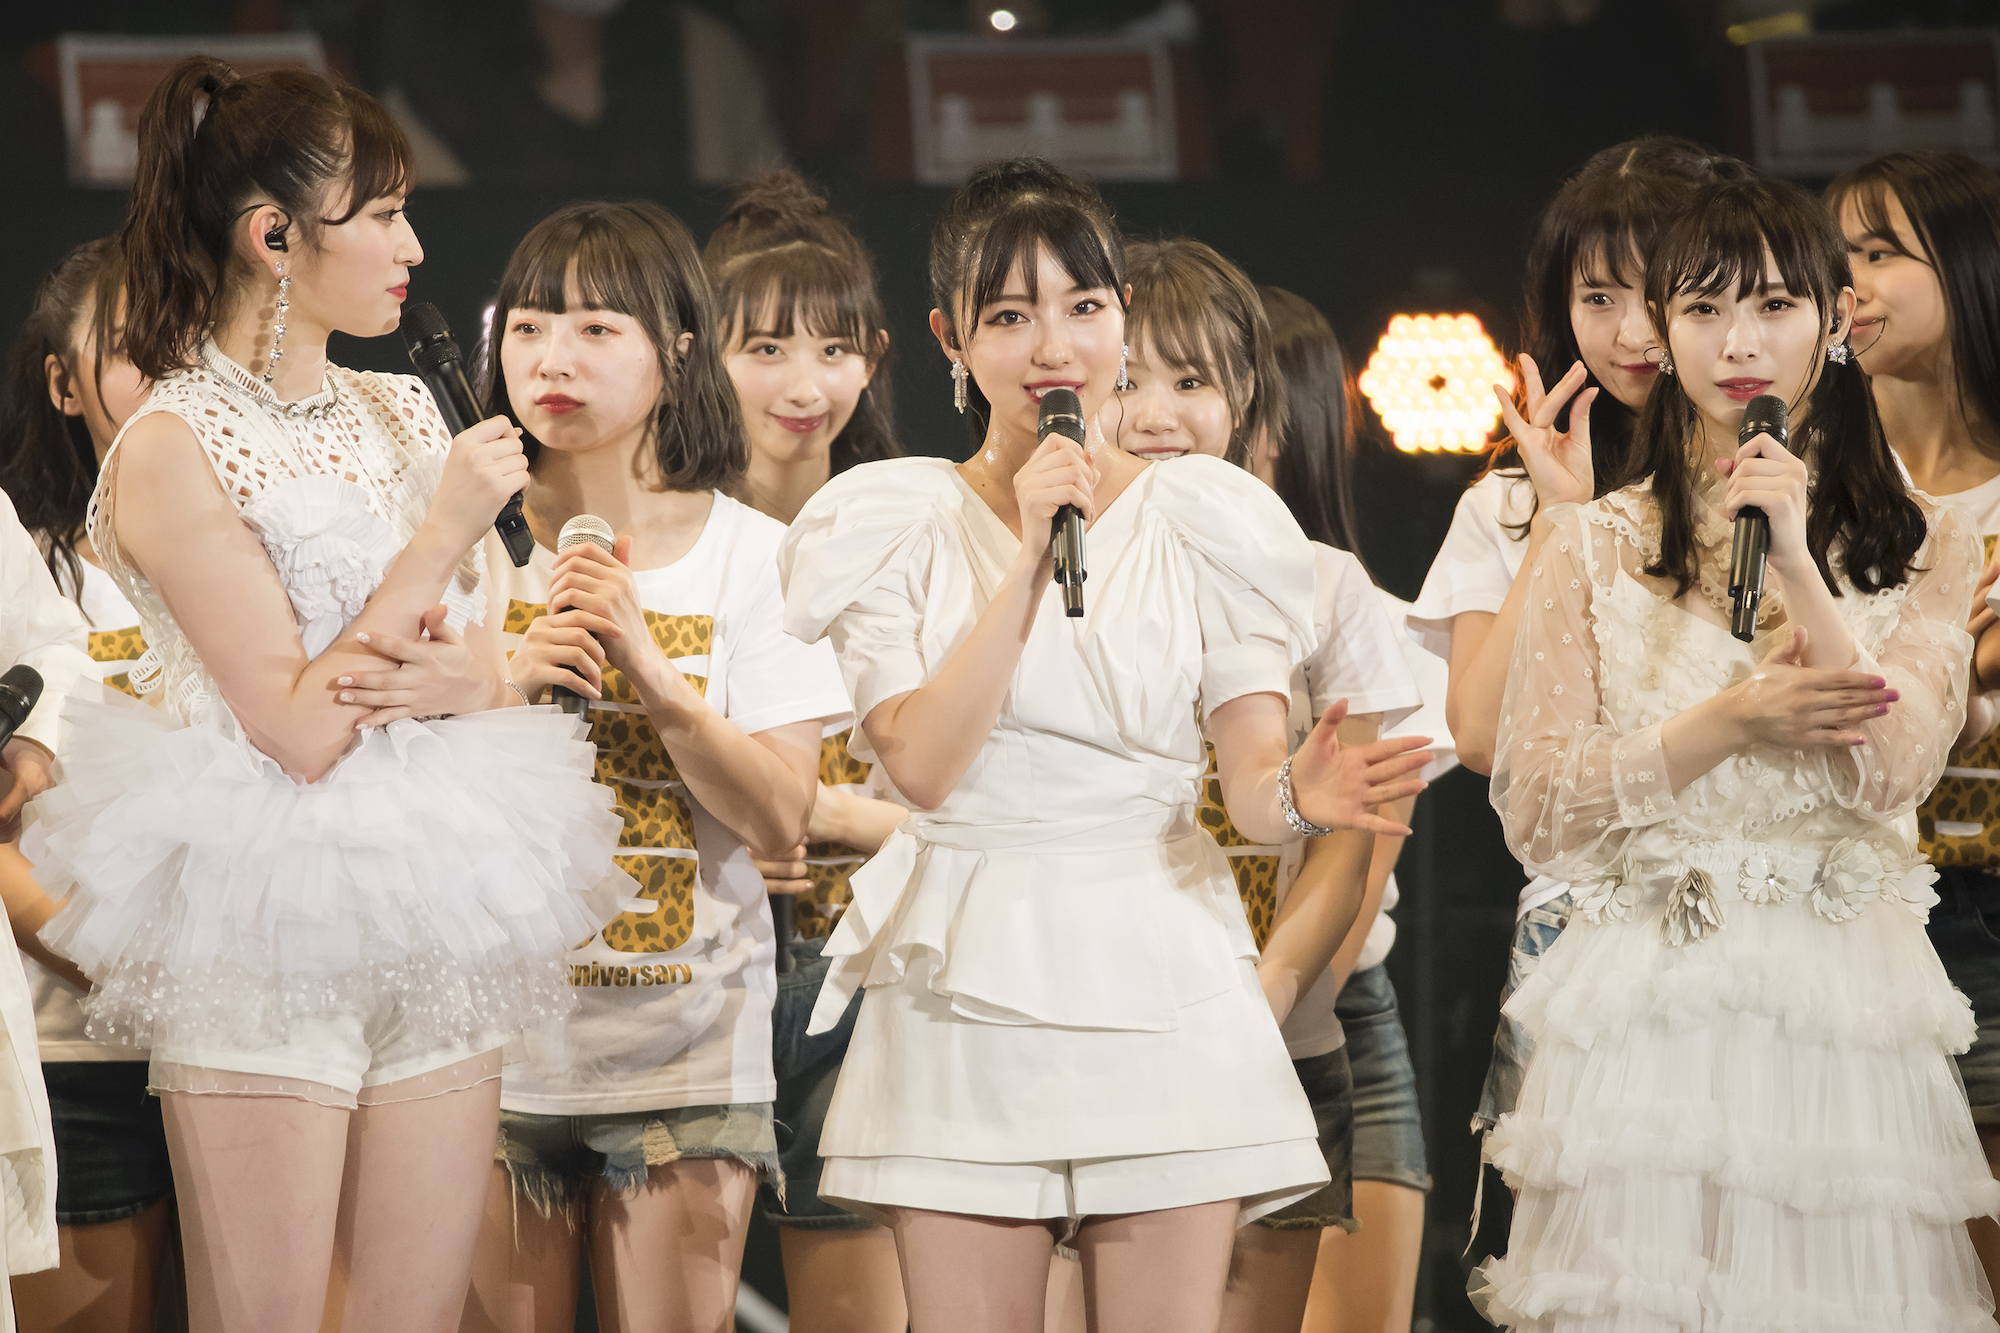 NMB48の10周年記念ライブ『NMB48 10th Anniversary LIVE 〜心をひとつに、One for all,All for one〜』(2020年10月23日(金)、大阪城ホールにて)